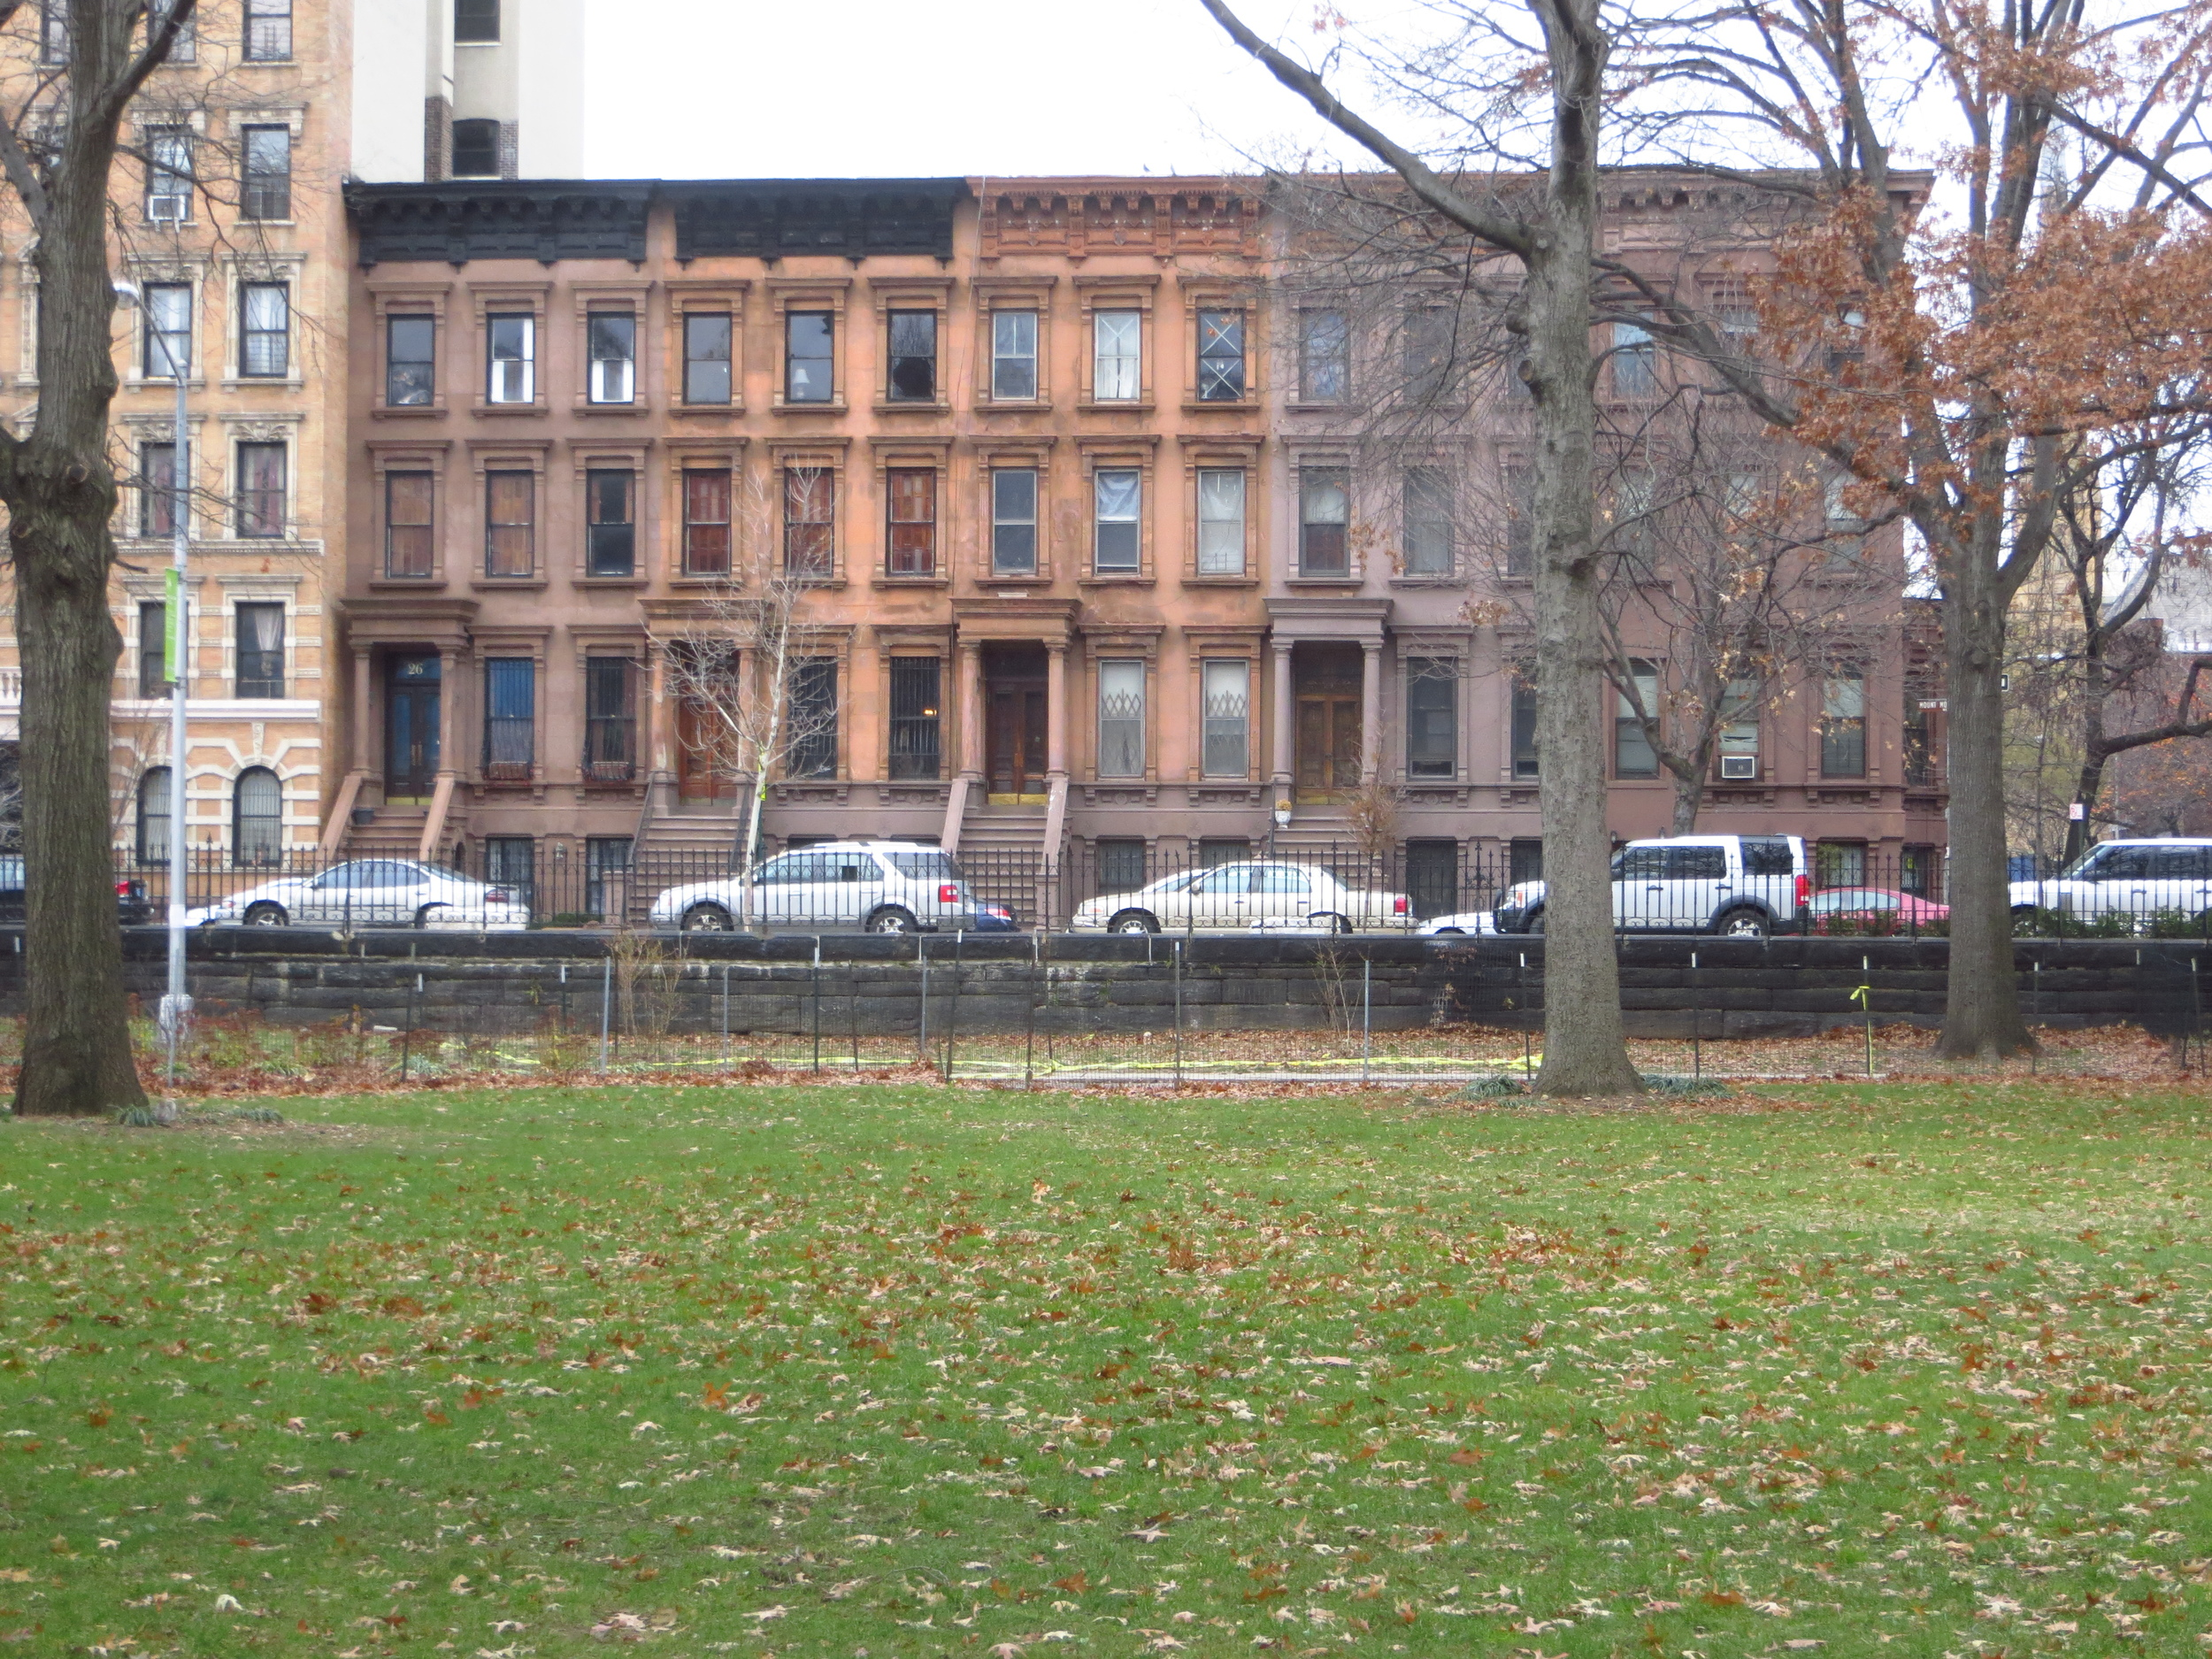 Brownstones from Marcus Garvey Park